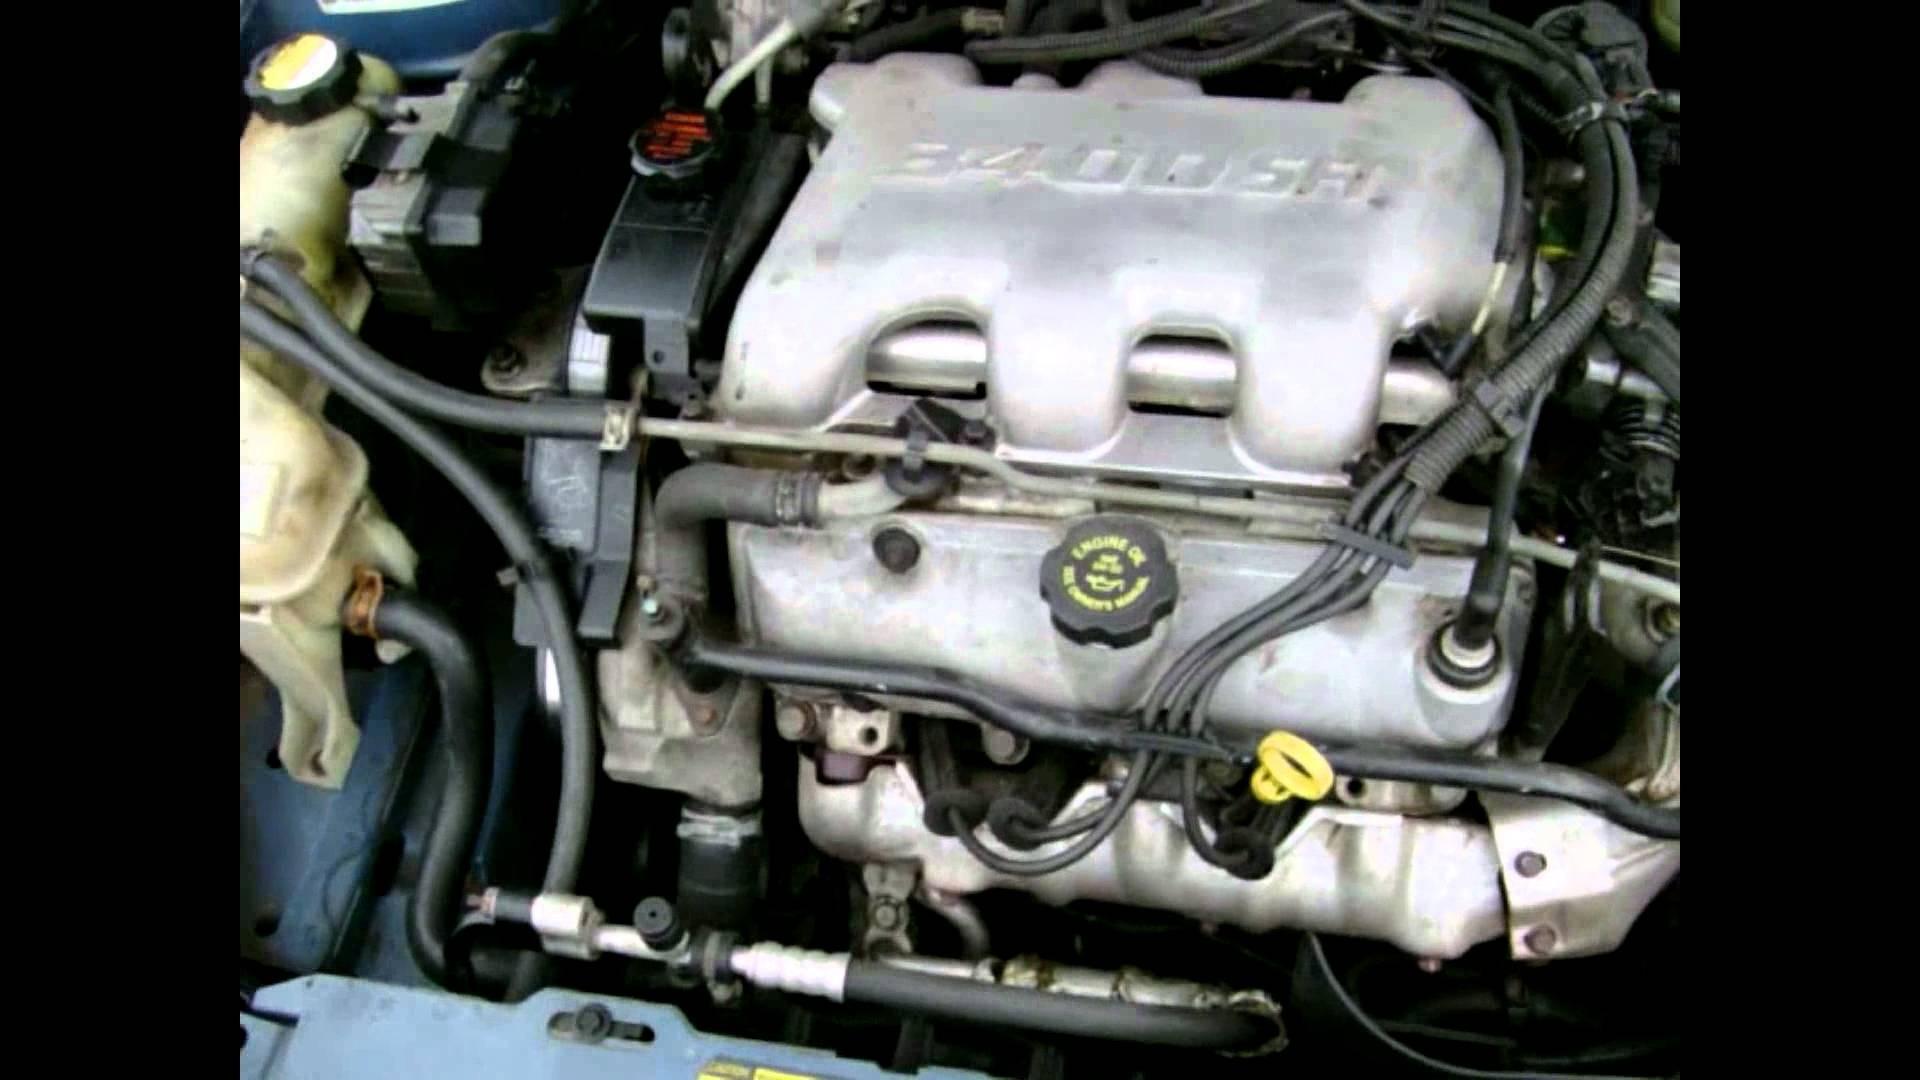 2001 Pontiac Aztek Engine Diagram 3400 Gm Engine 3 4 Liter Motor Explanation and Discussion